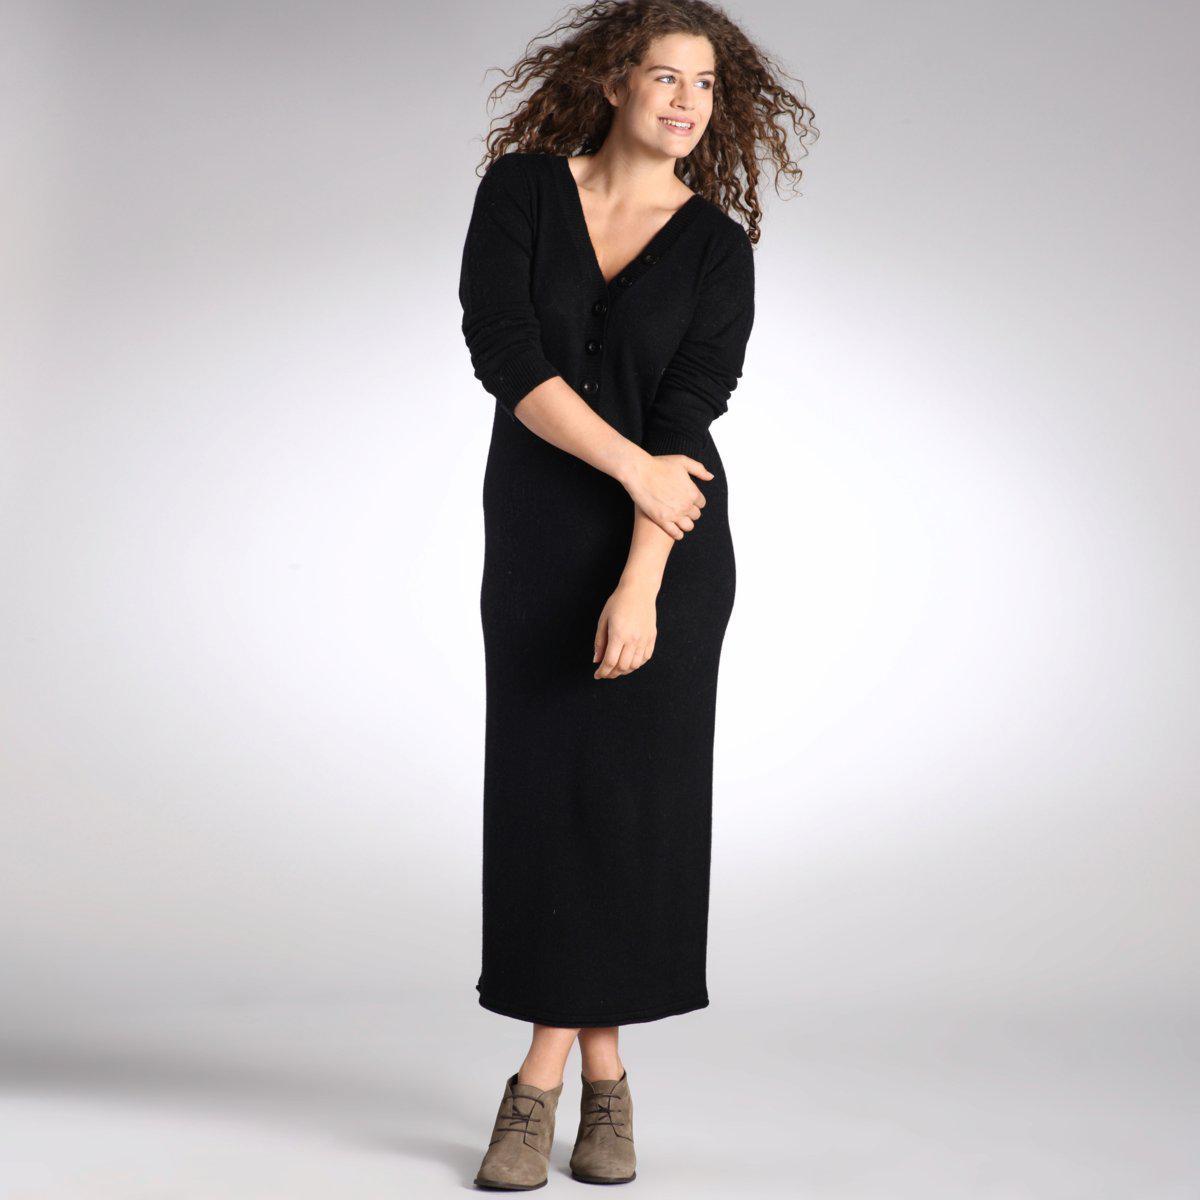 bradyna foremata 282 - Βραδυνα Φορεματα Plus Size Χειμώνας 2012 κωδ. 324210453